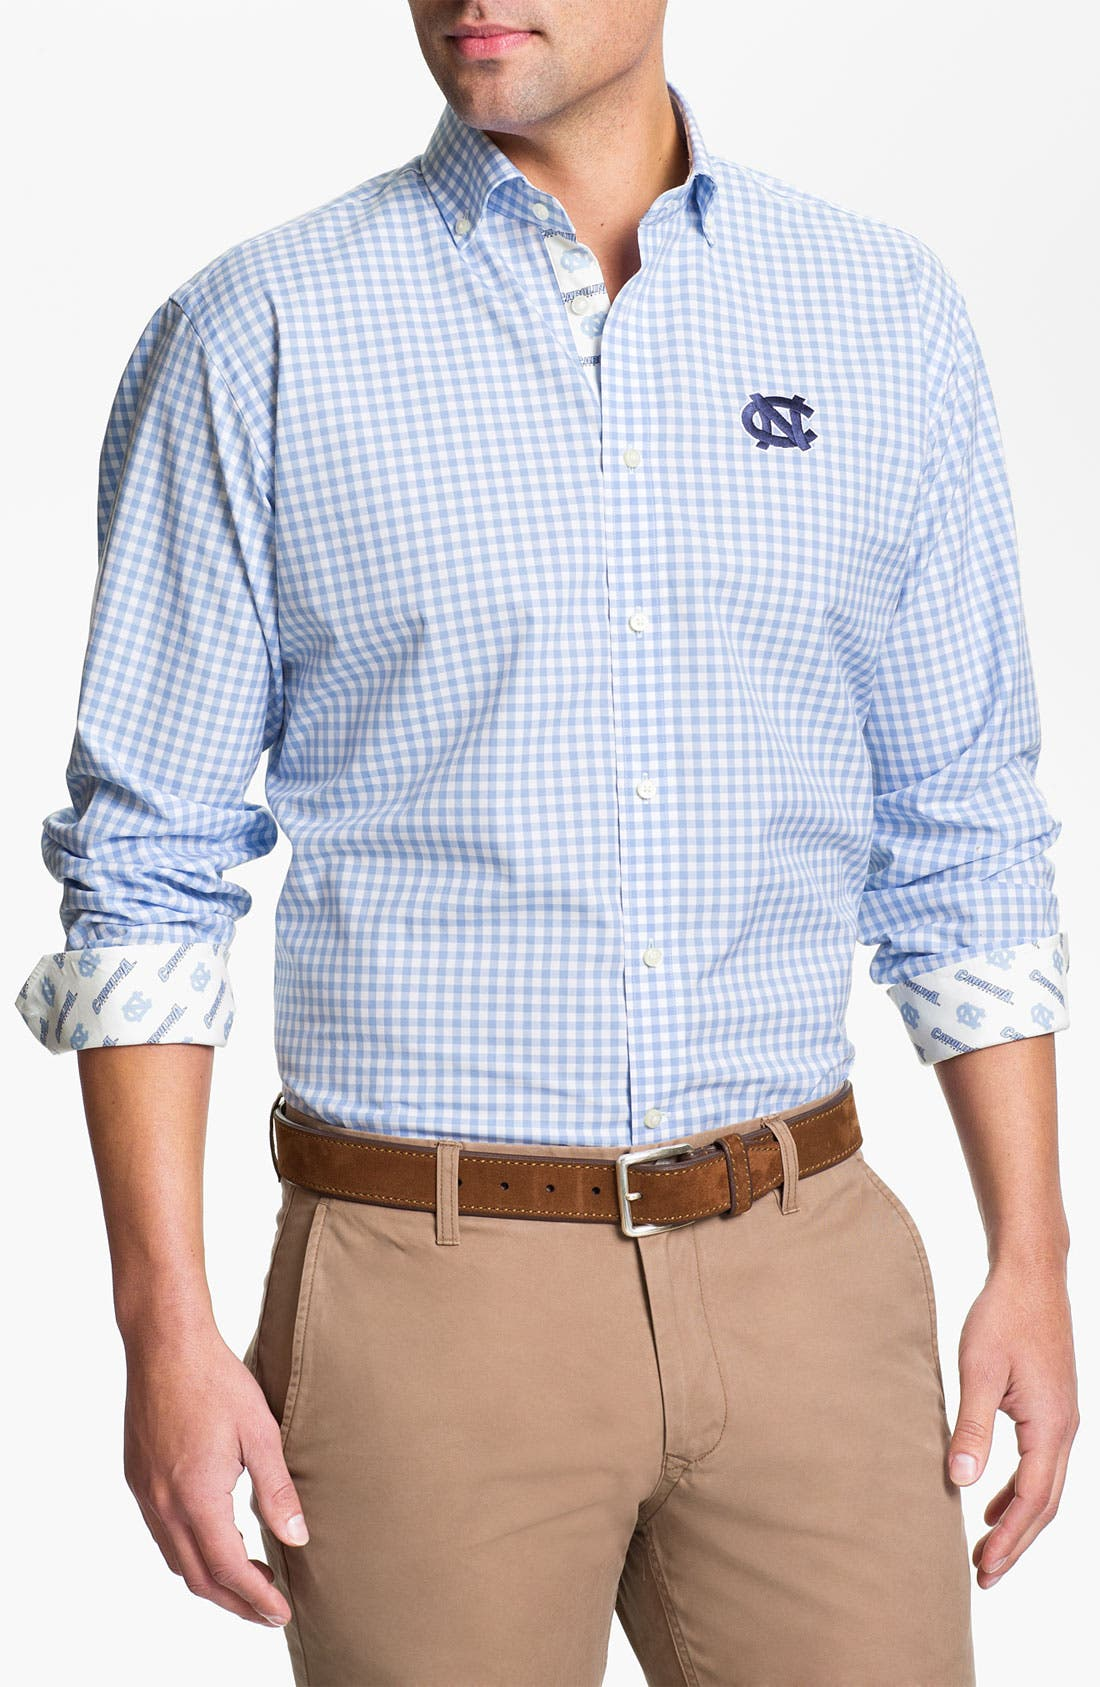 Alternate Image 1 Selected - Thomas Dean 'University of North Carolina' Traditional Fit Sport Shirt